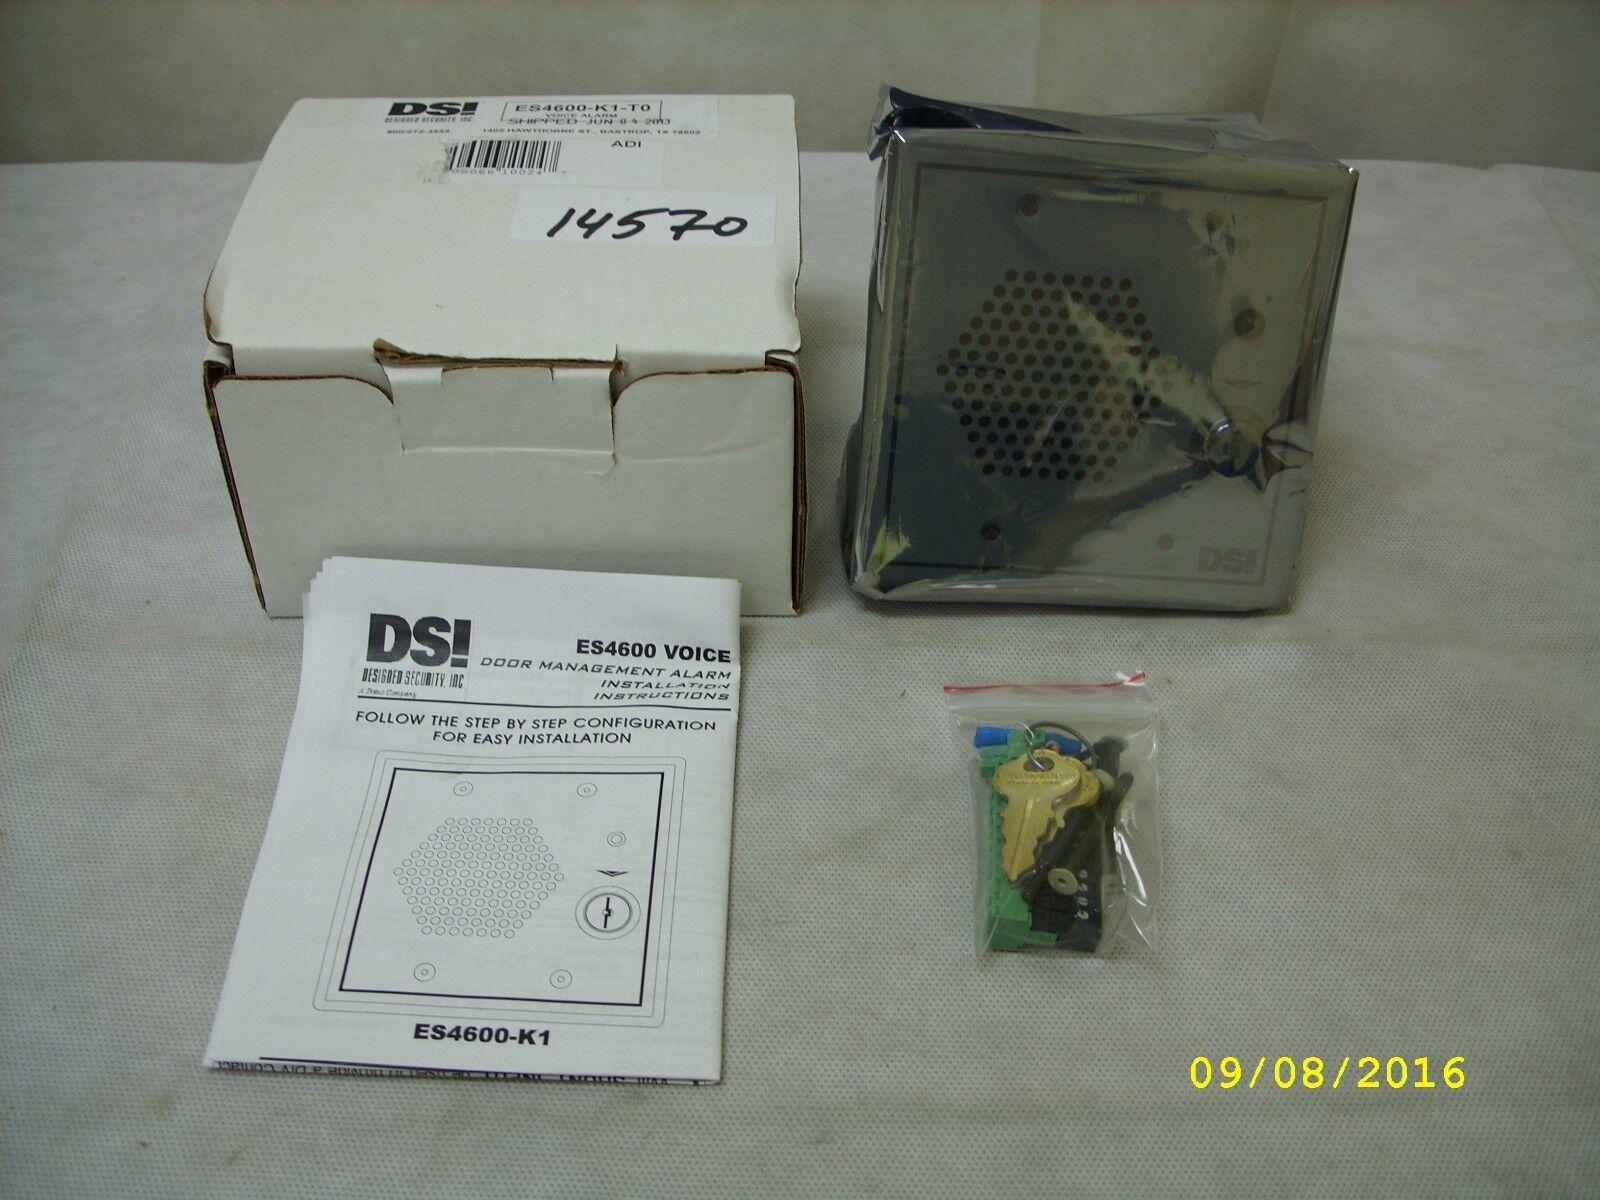 NEW Designed Security Inc. DSI - Voice Synthesized Door Prop Alarm ES4600-K1-T0